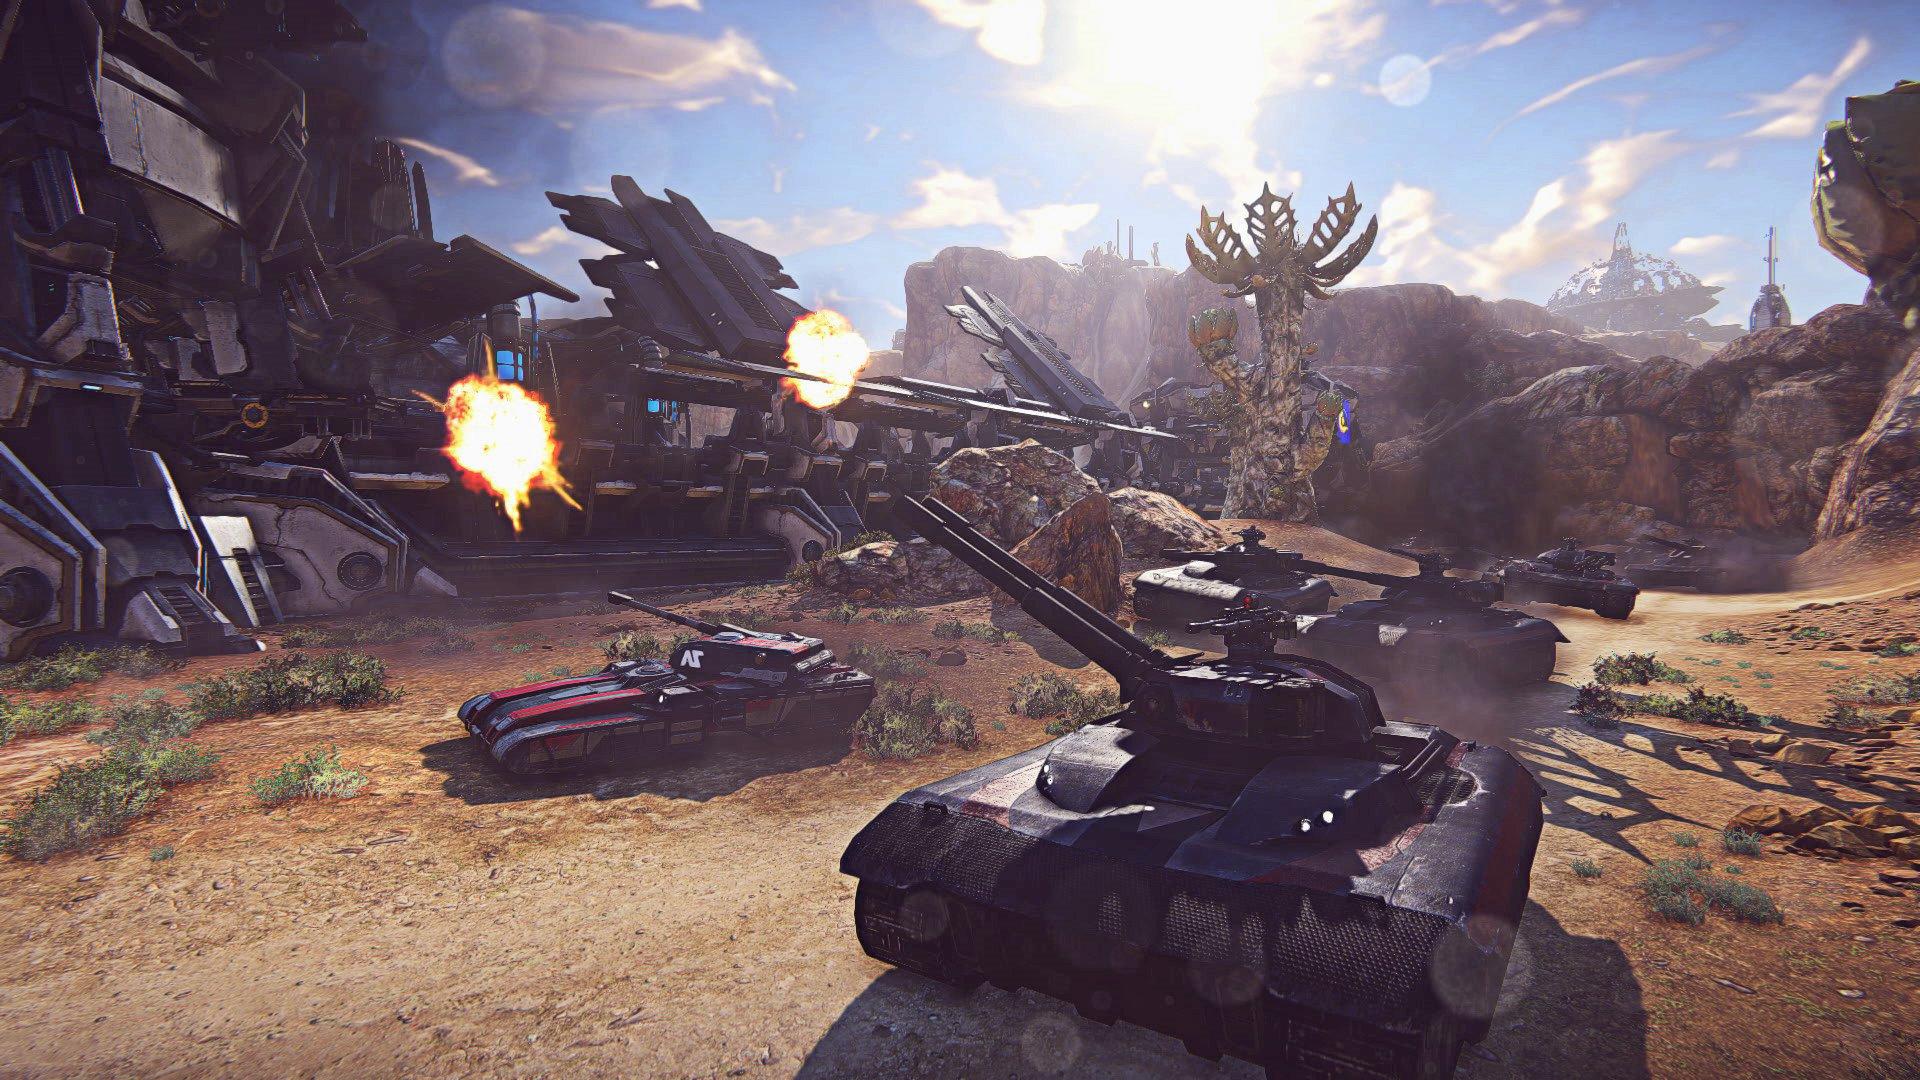 PlanetSide 2 (PS4 / PlayStation 4) Game Profile | News ...  PlanetSide 2 (P...